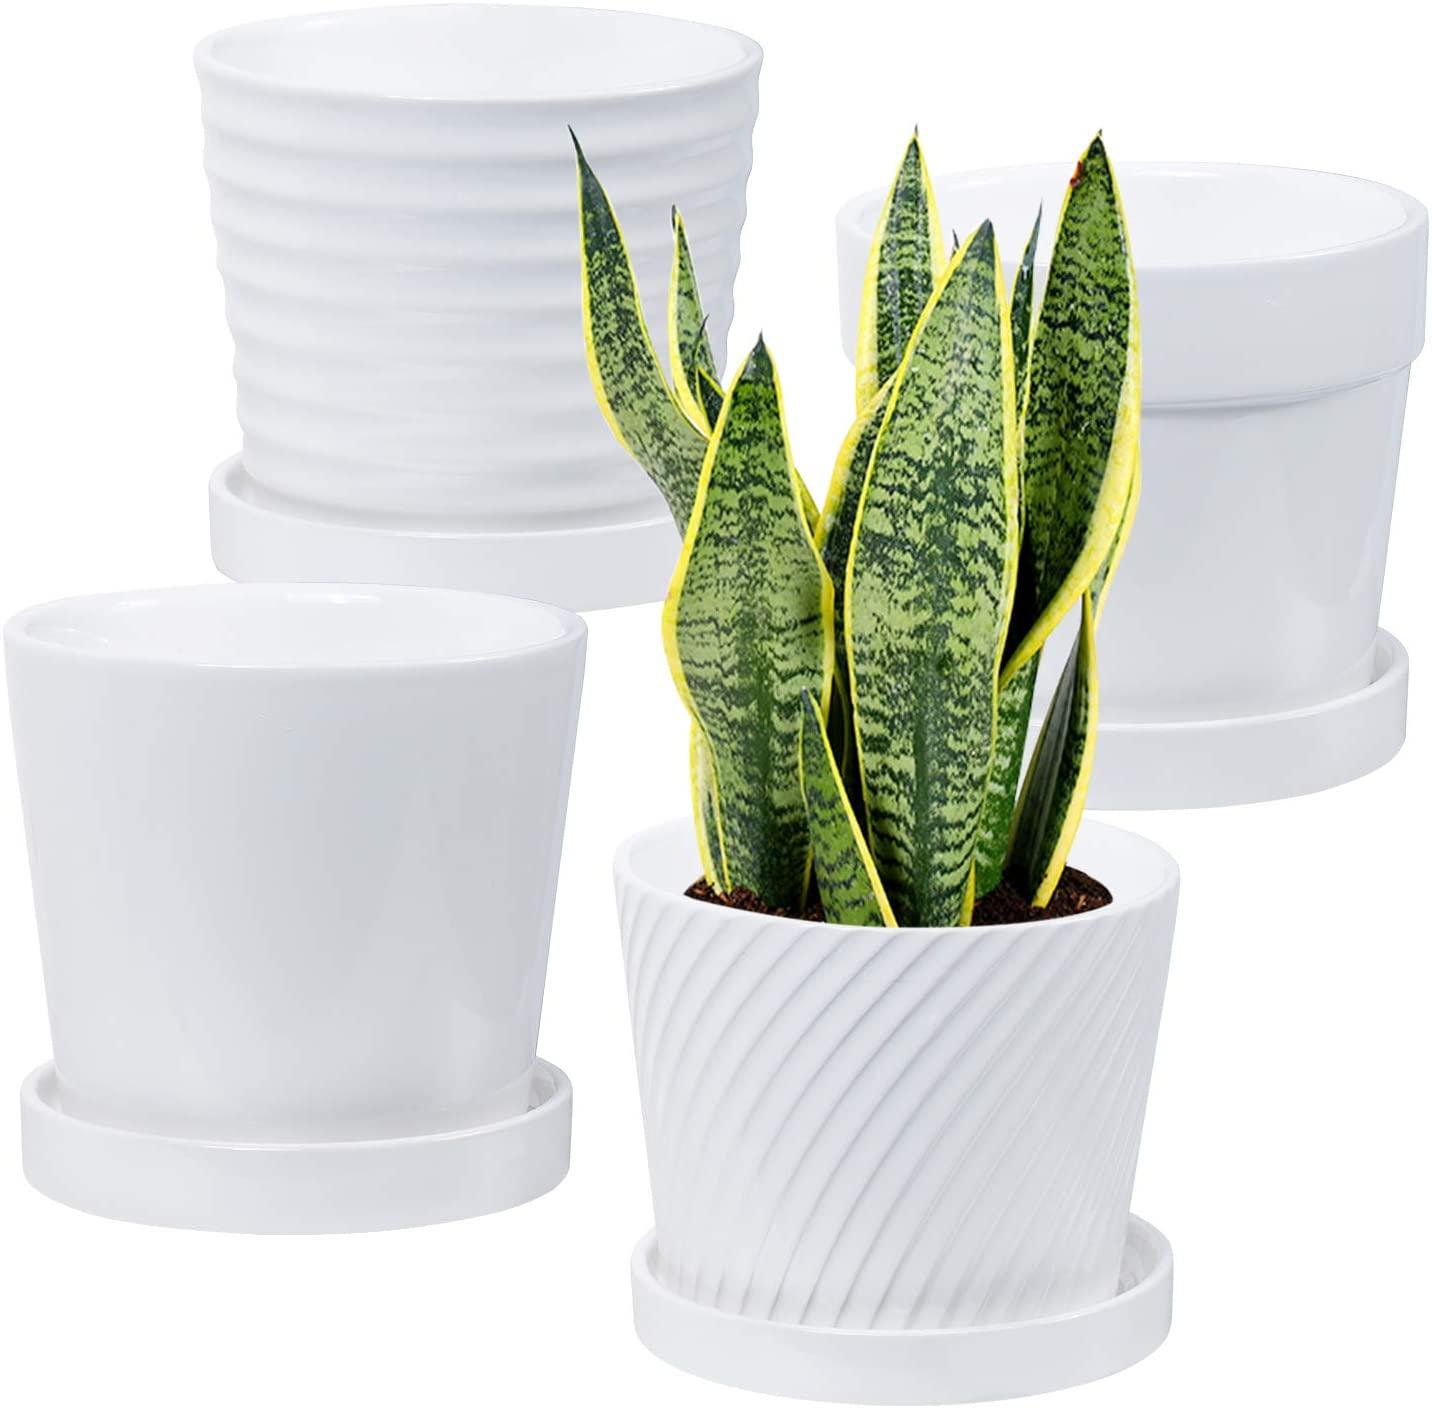 Baarrtt Plant Pots, 4Pcs Ceramic Pots Flower Planter with Connected Saucer for Plants Indoor 5.5 Inch House Plant Pot, White